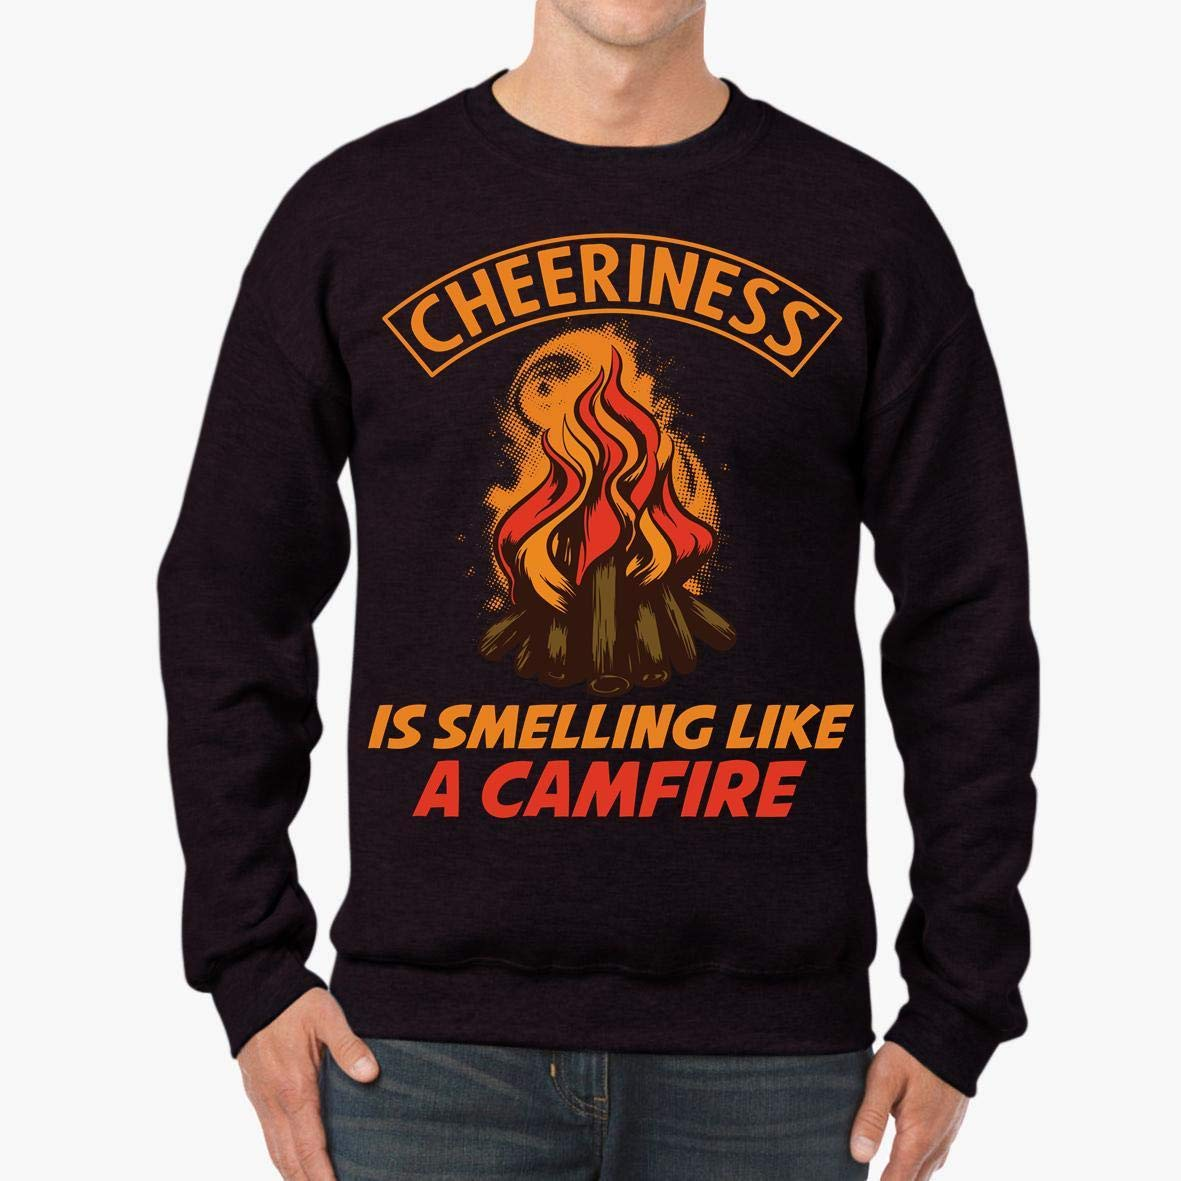 tee Camping Family Campfire Fire RV Funny Unisex Sweatshirt